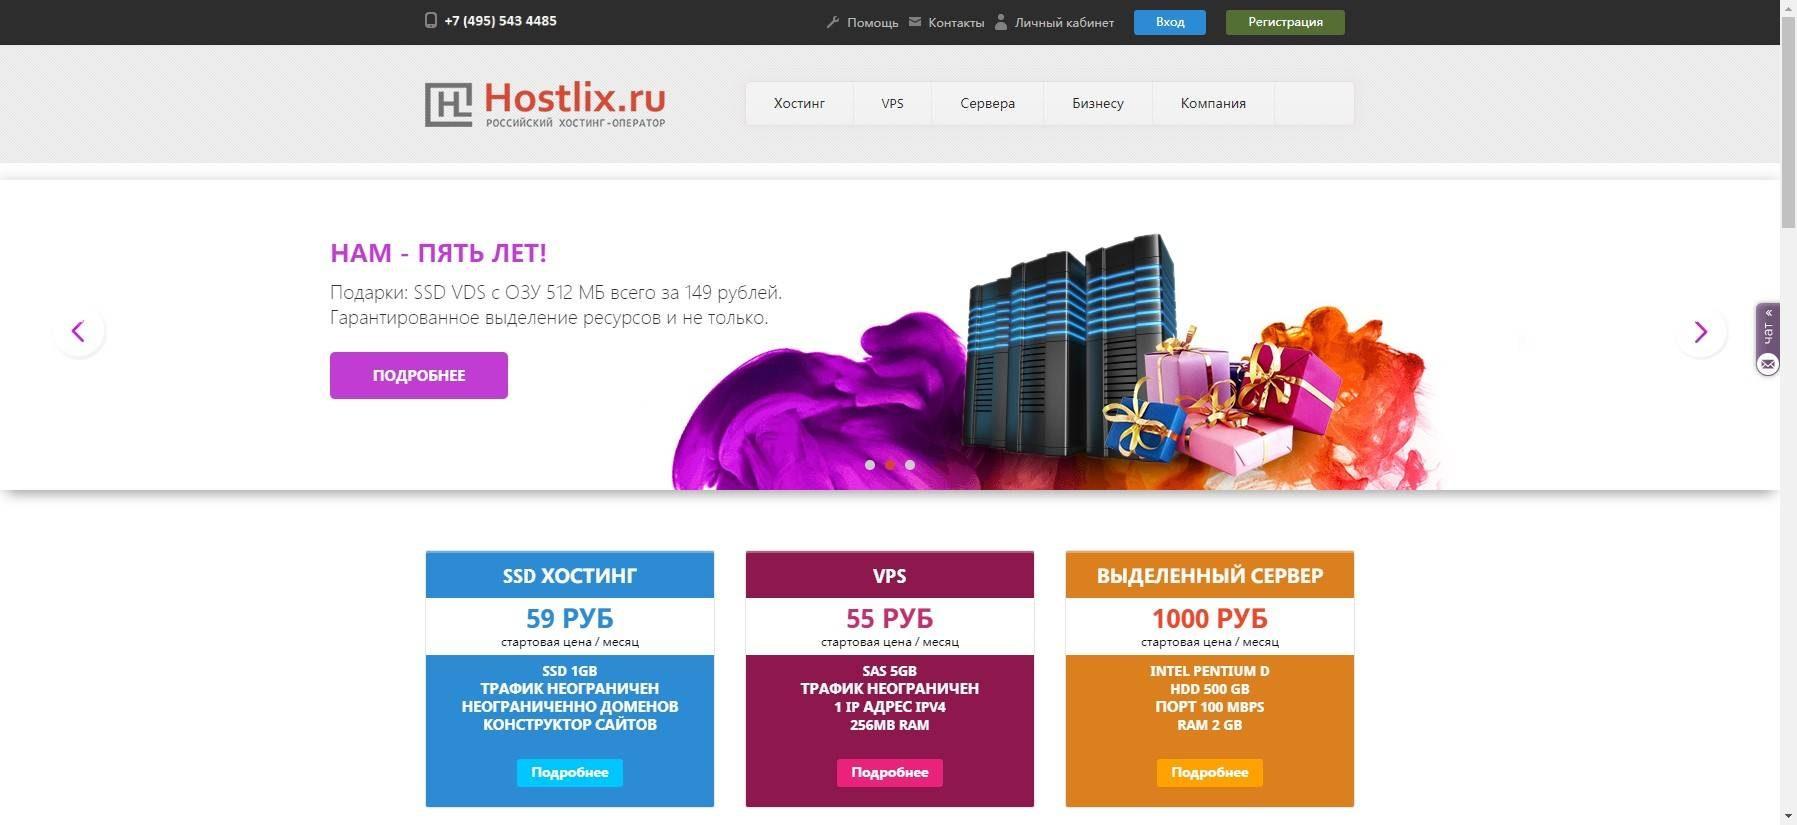 hostlix2019111501-7047318